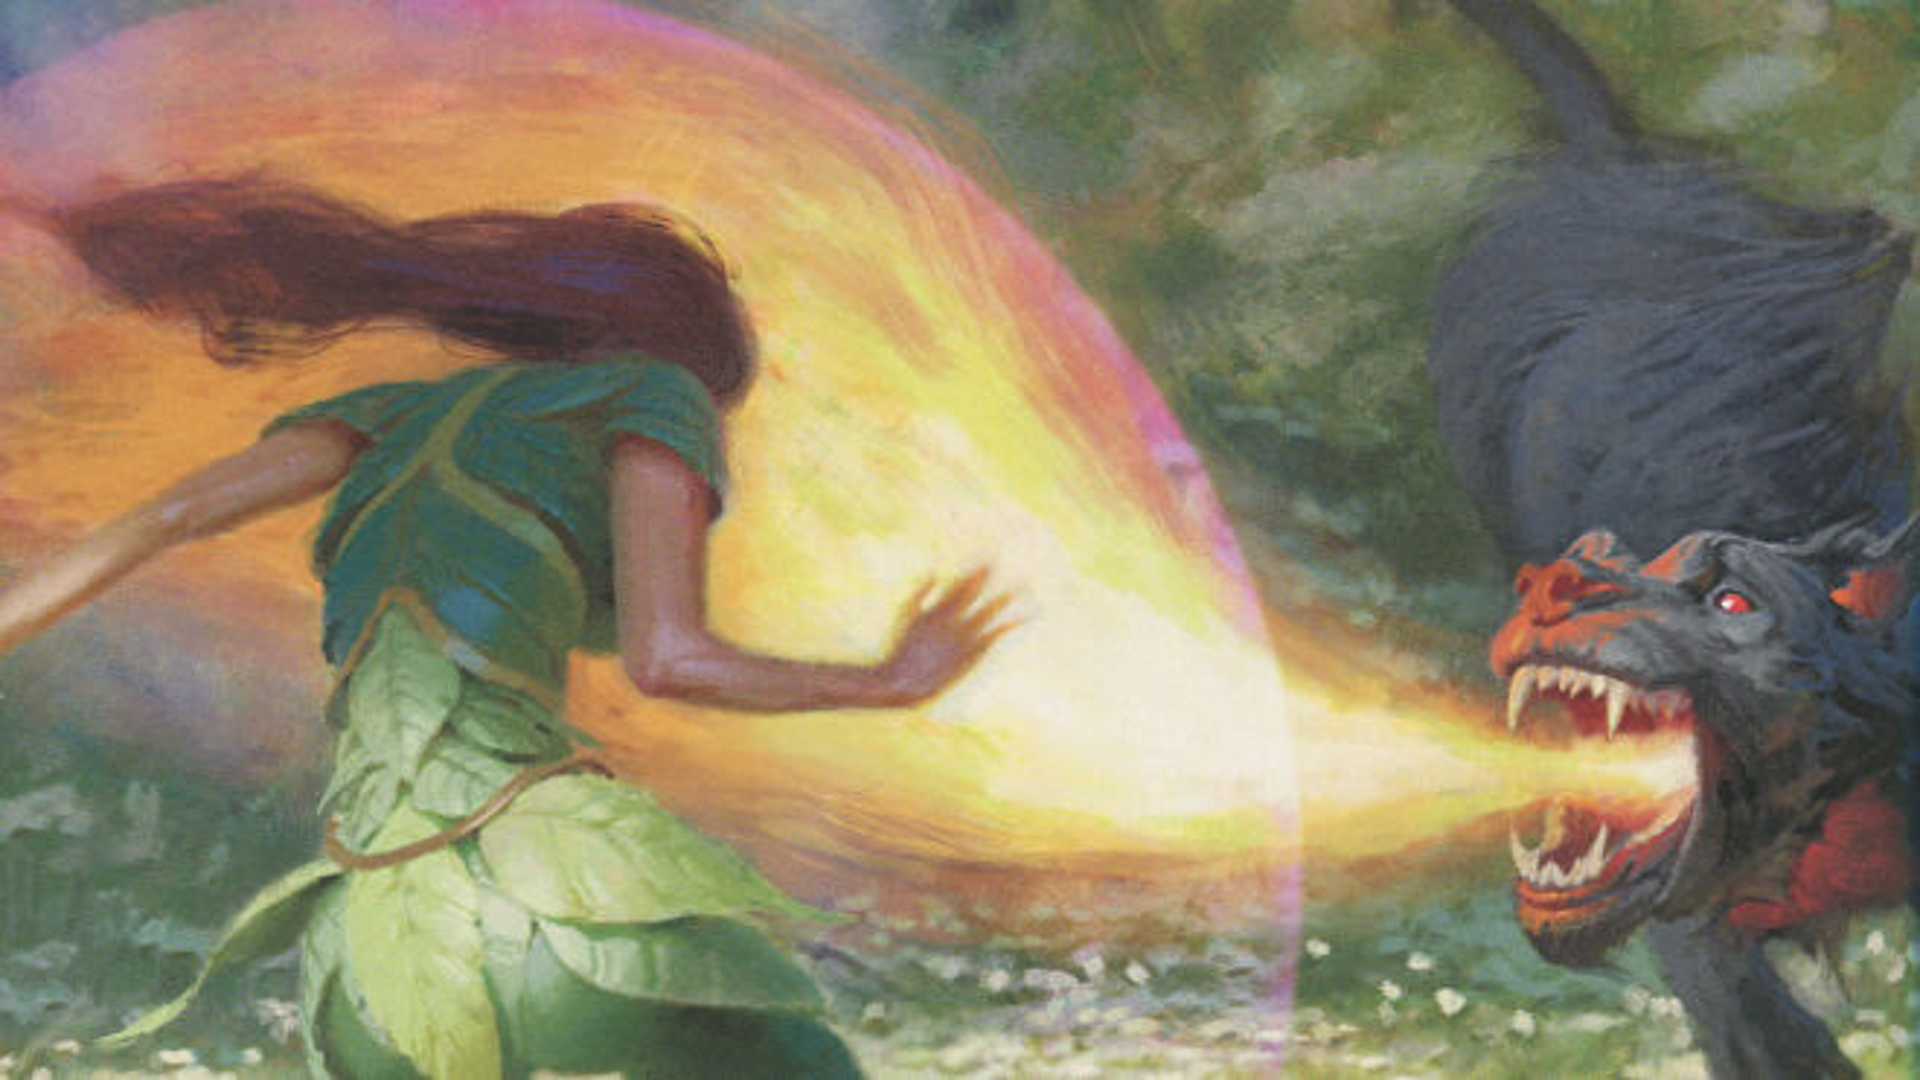 Dungeons & Dragons 5e Players Handbook artwork 12